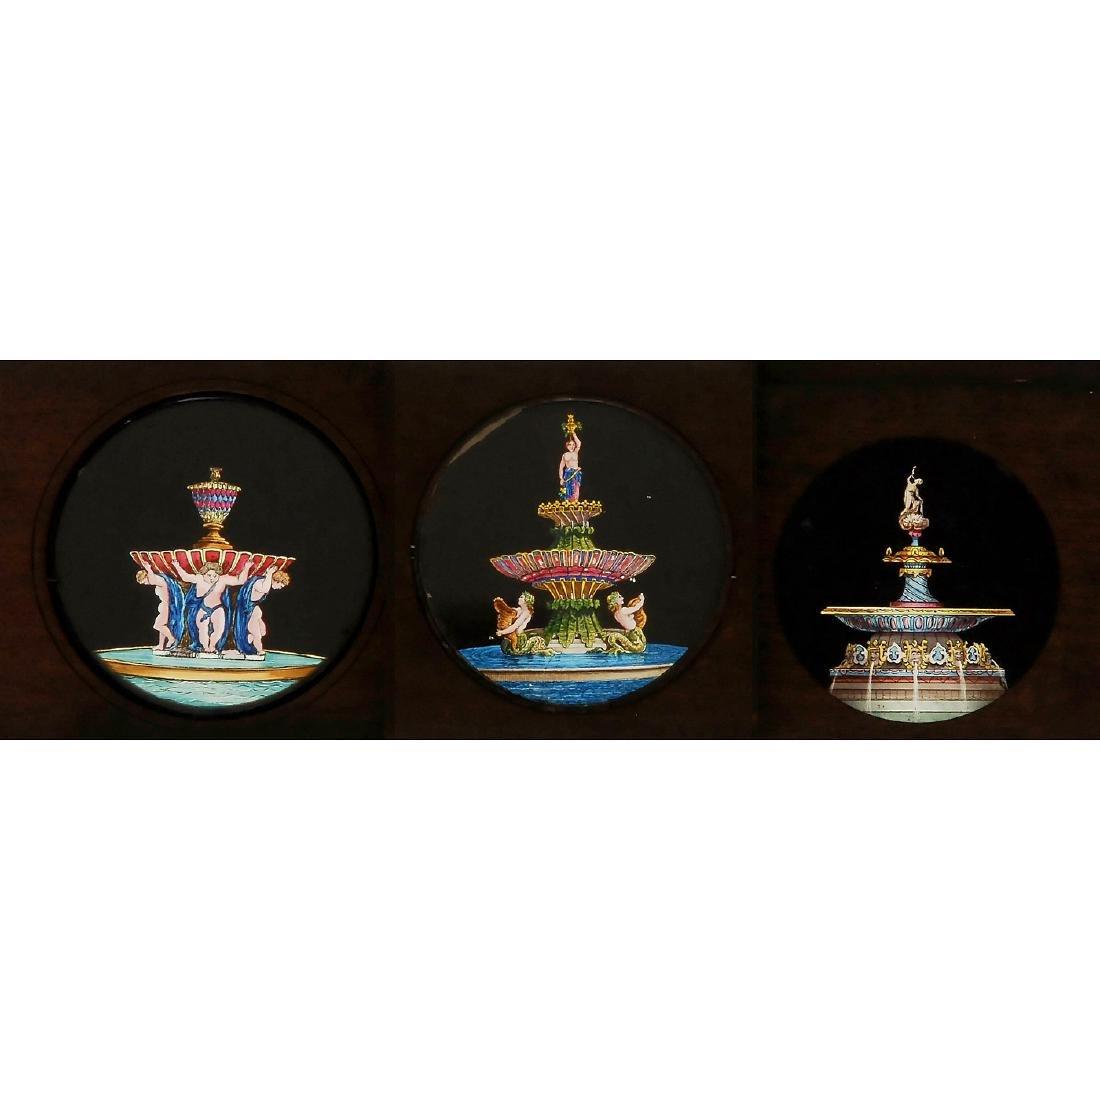 3 Magic Lantern Fountain Slides, c. 1860